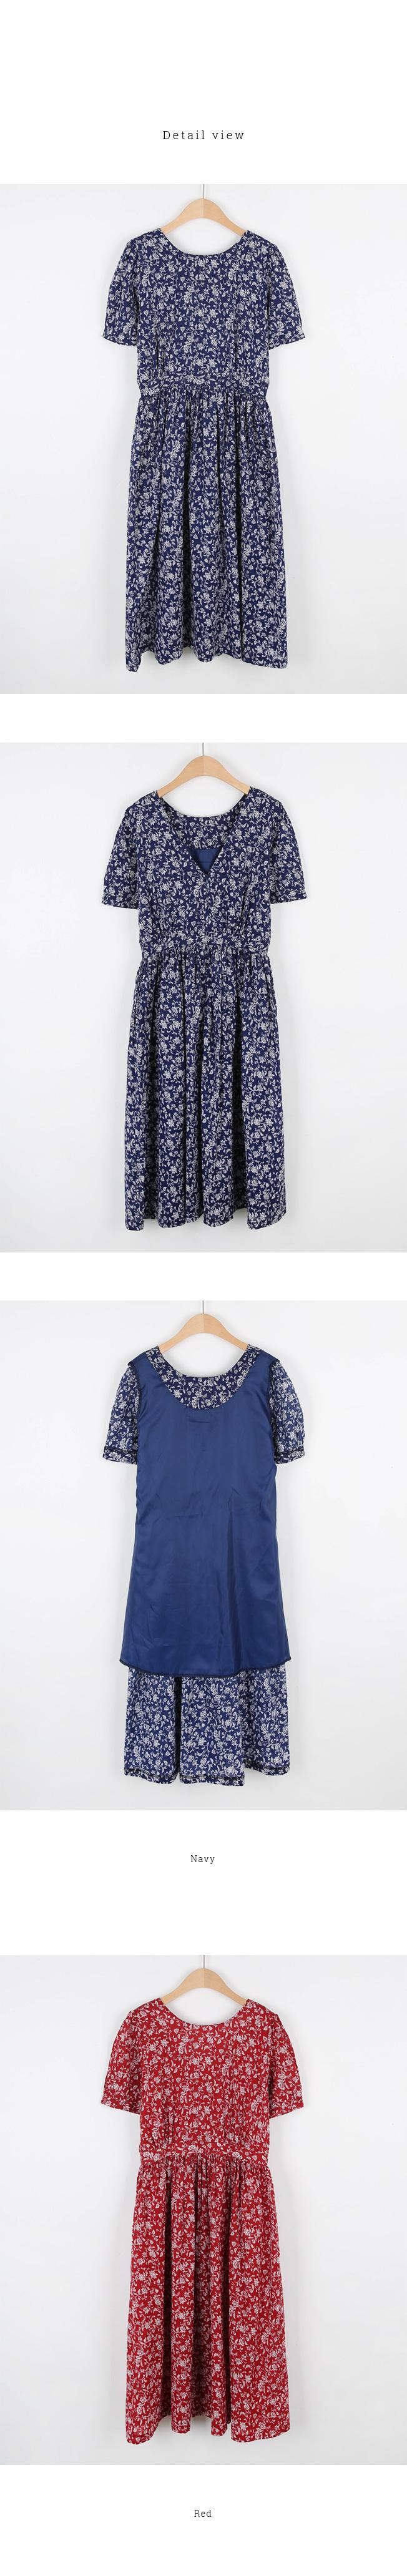 One point flower dress